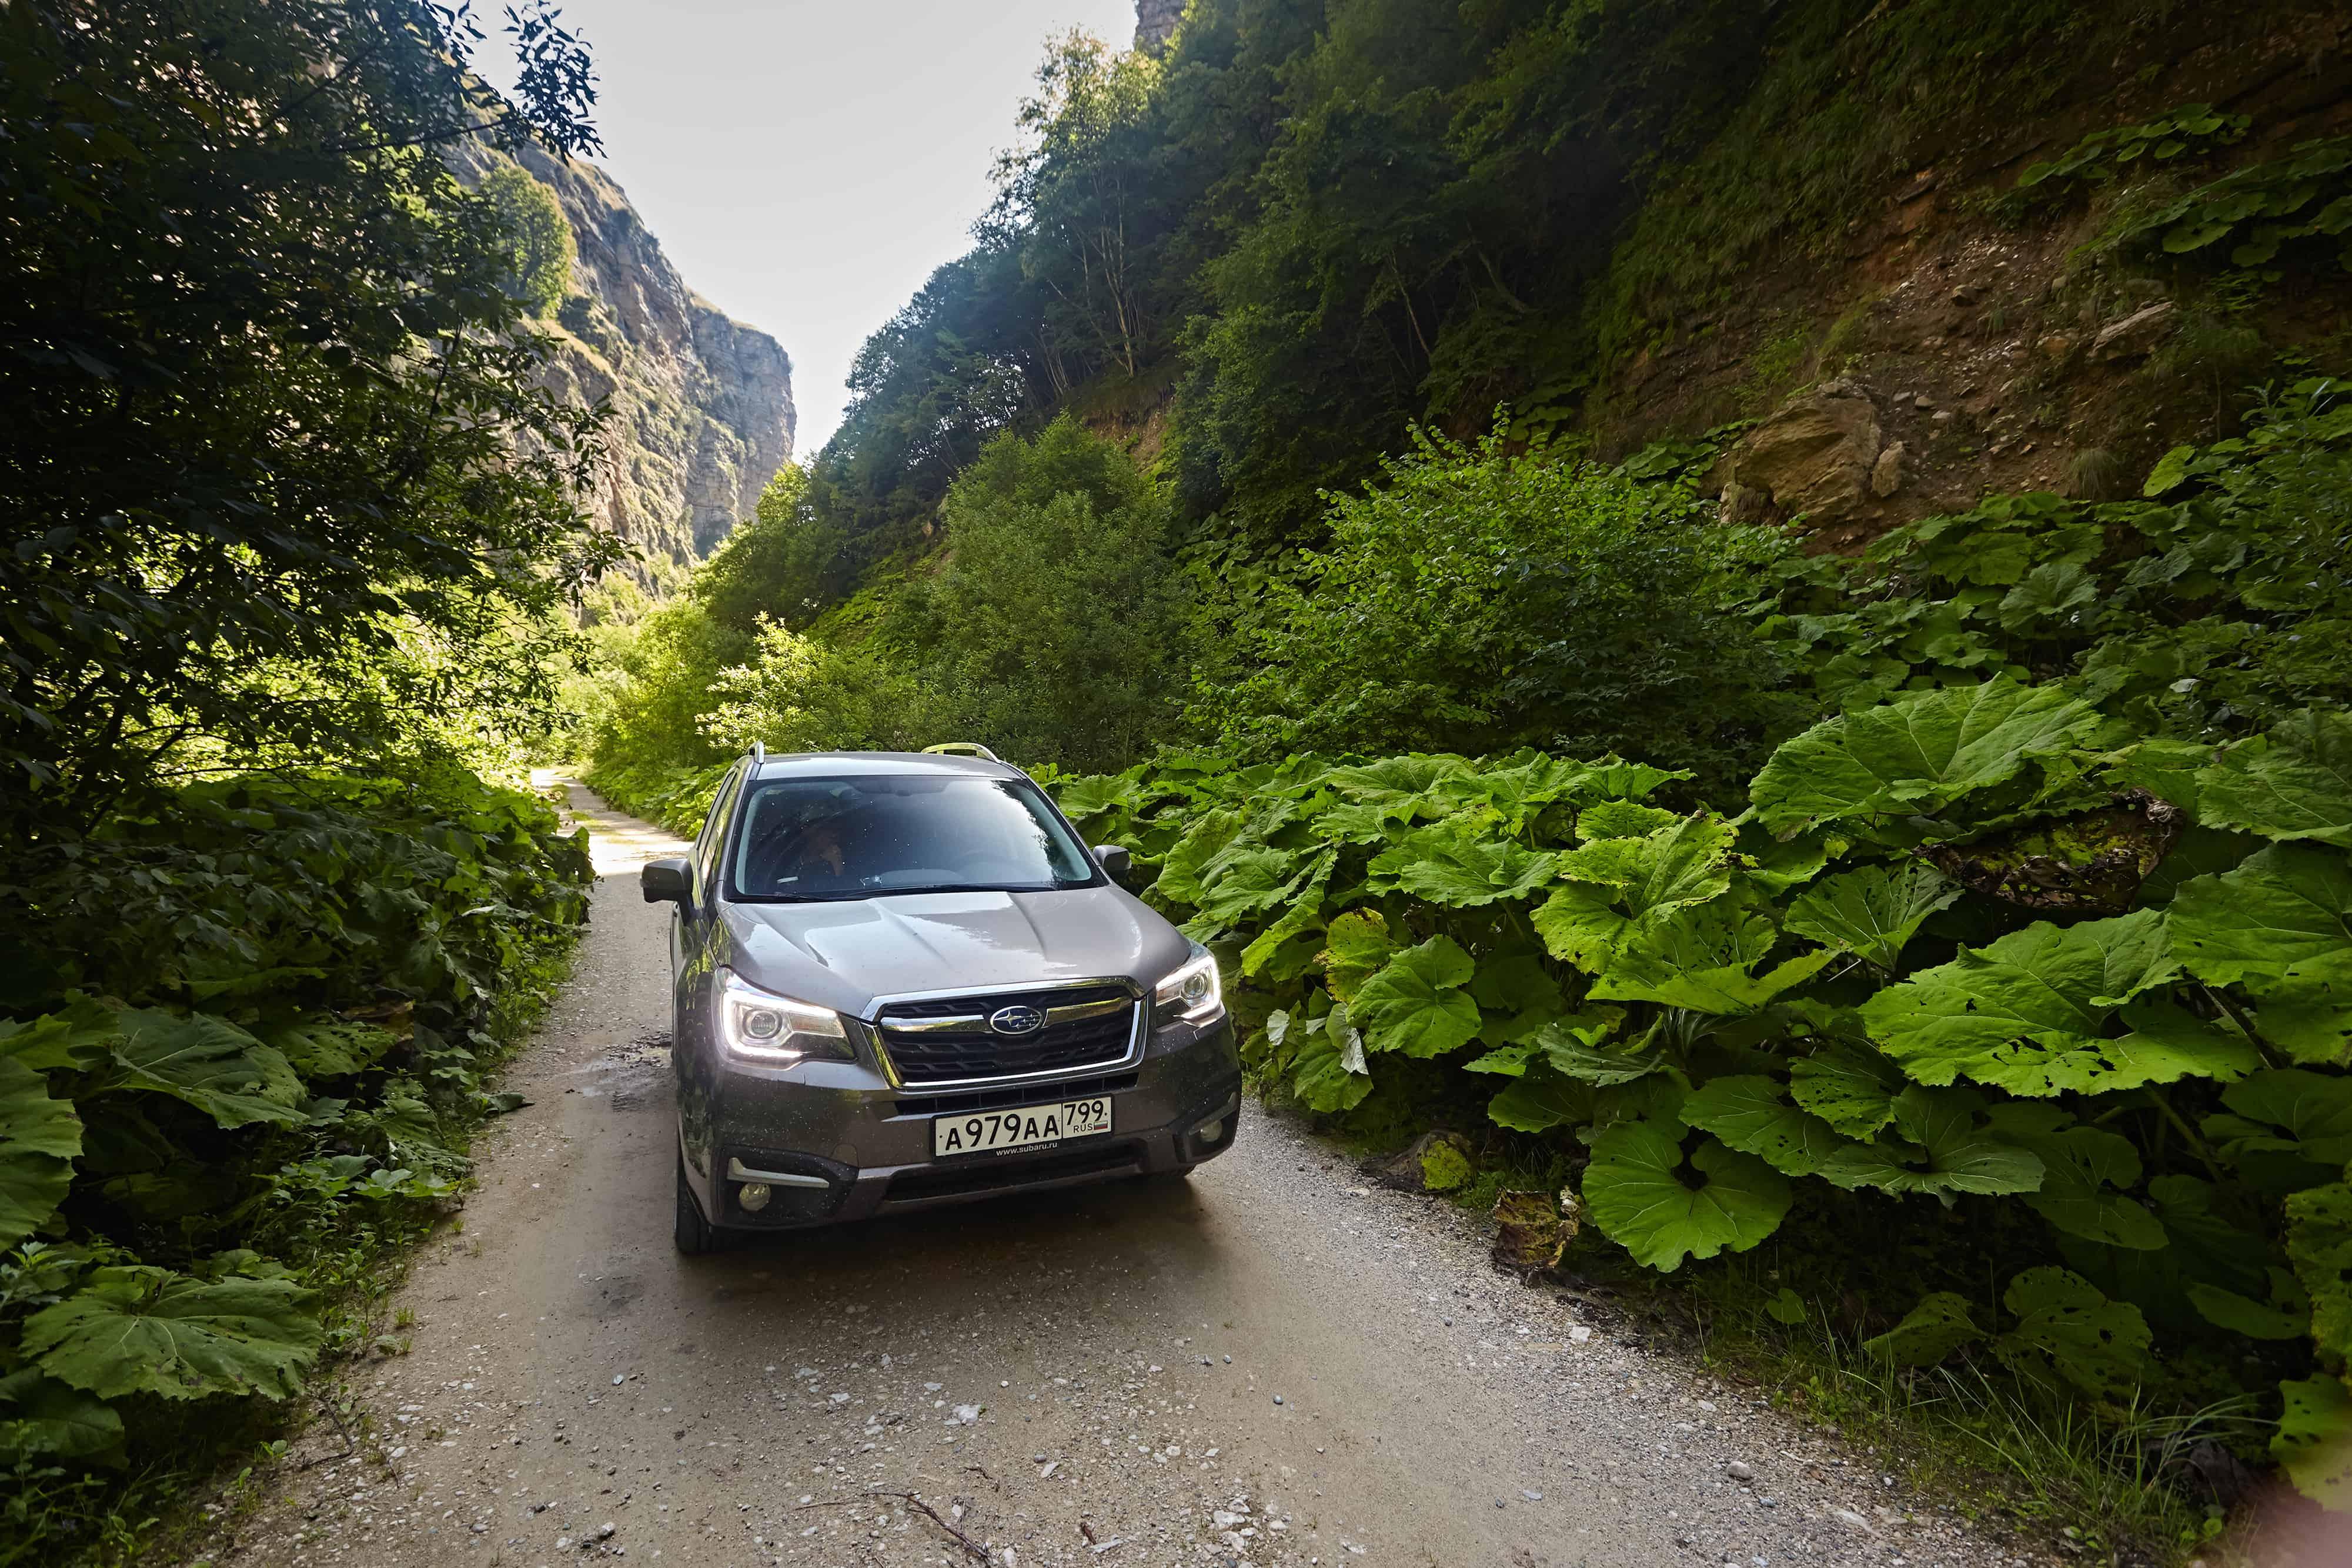 Subaru Recalls Certain 2019 Crosstrek, Forester, and Ascent vehicles